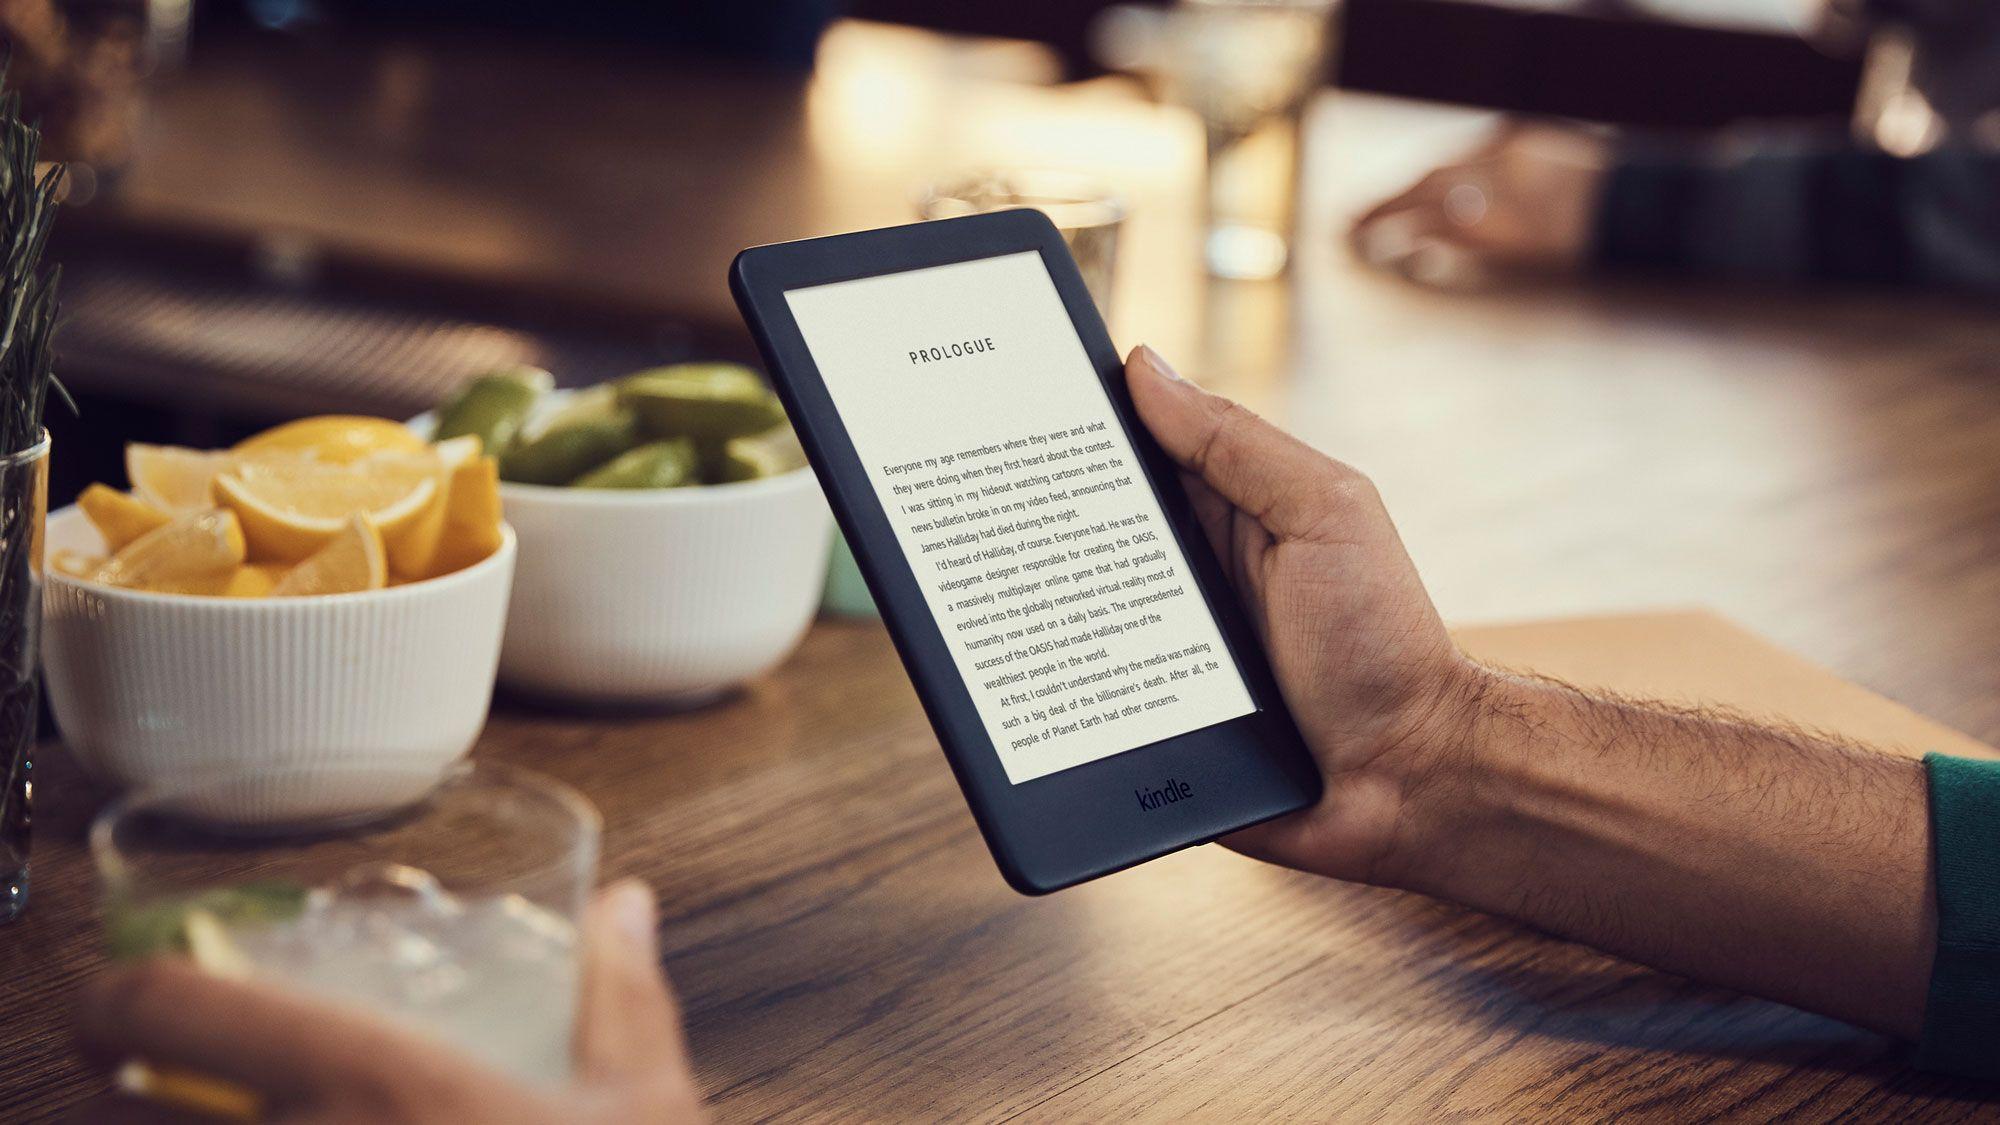 Ebooks Lords Of The Sith Free Ebook Kindle Ebook E Book Can i read my pdf on kindle